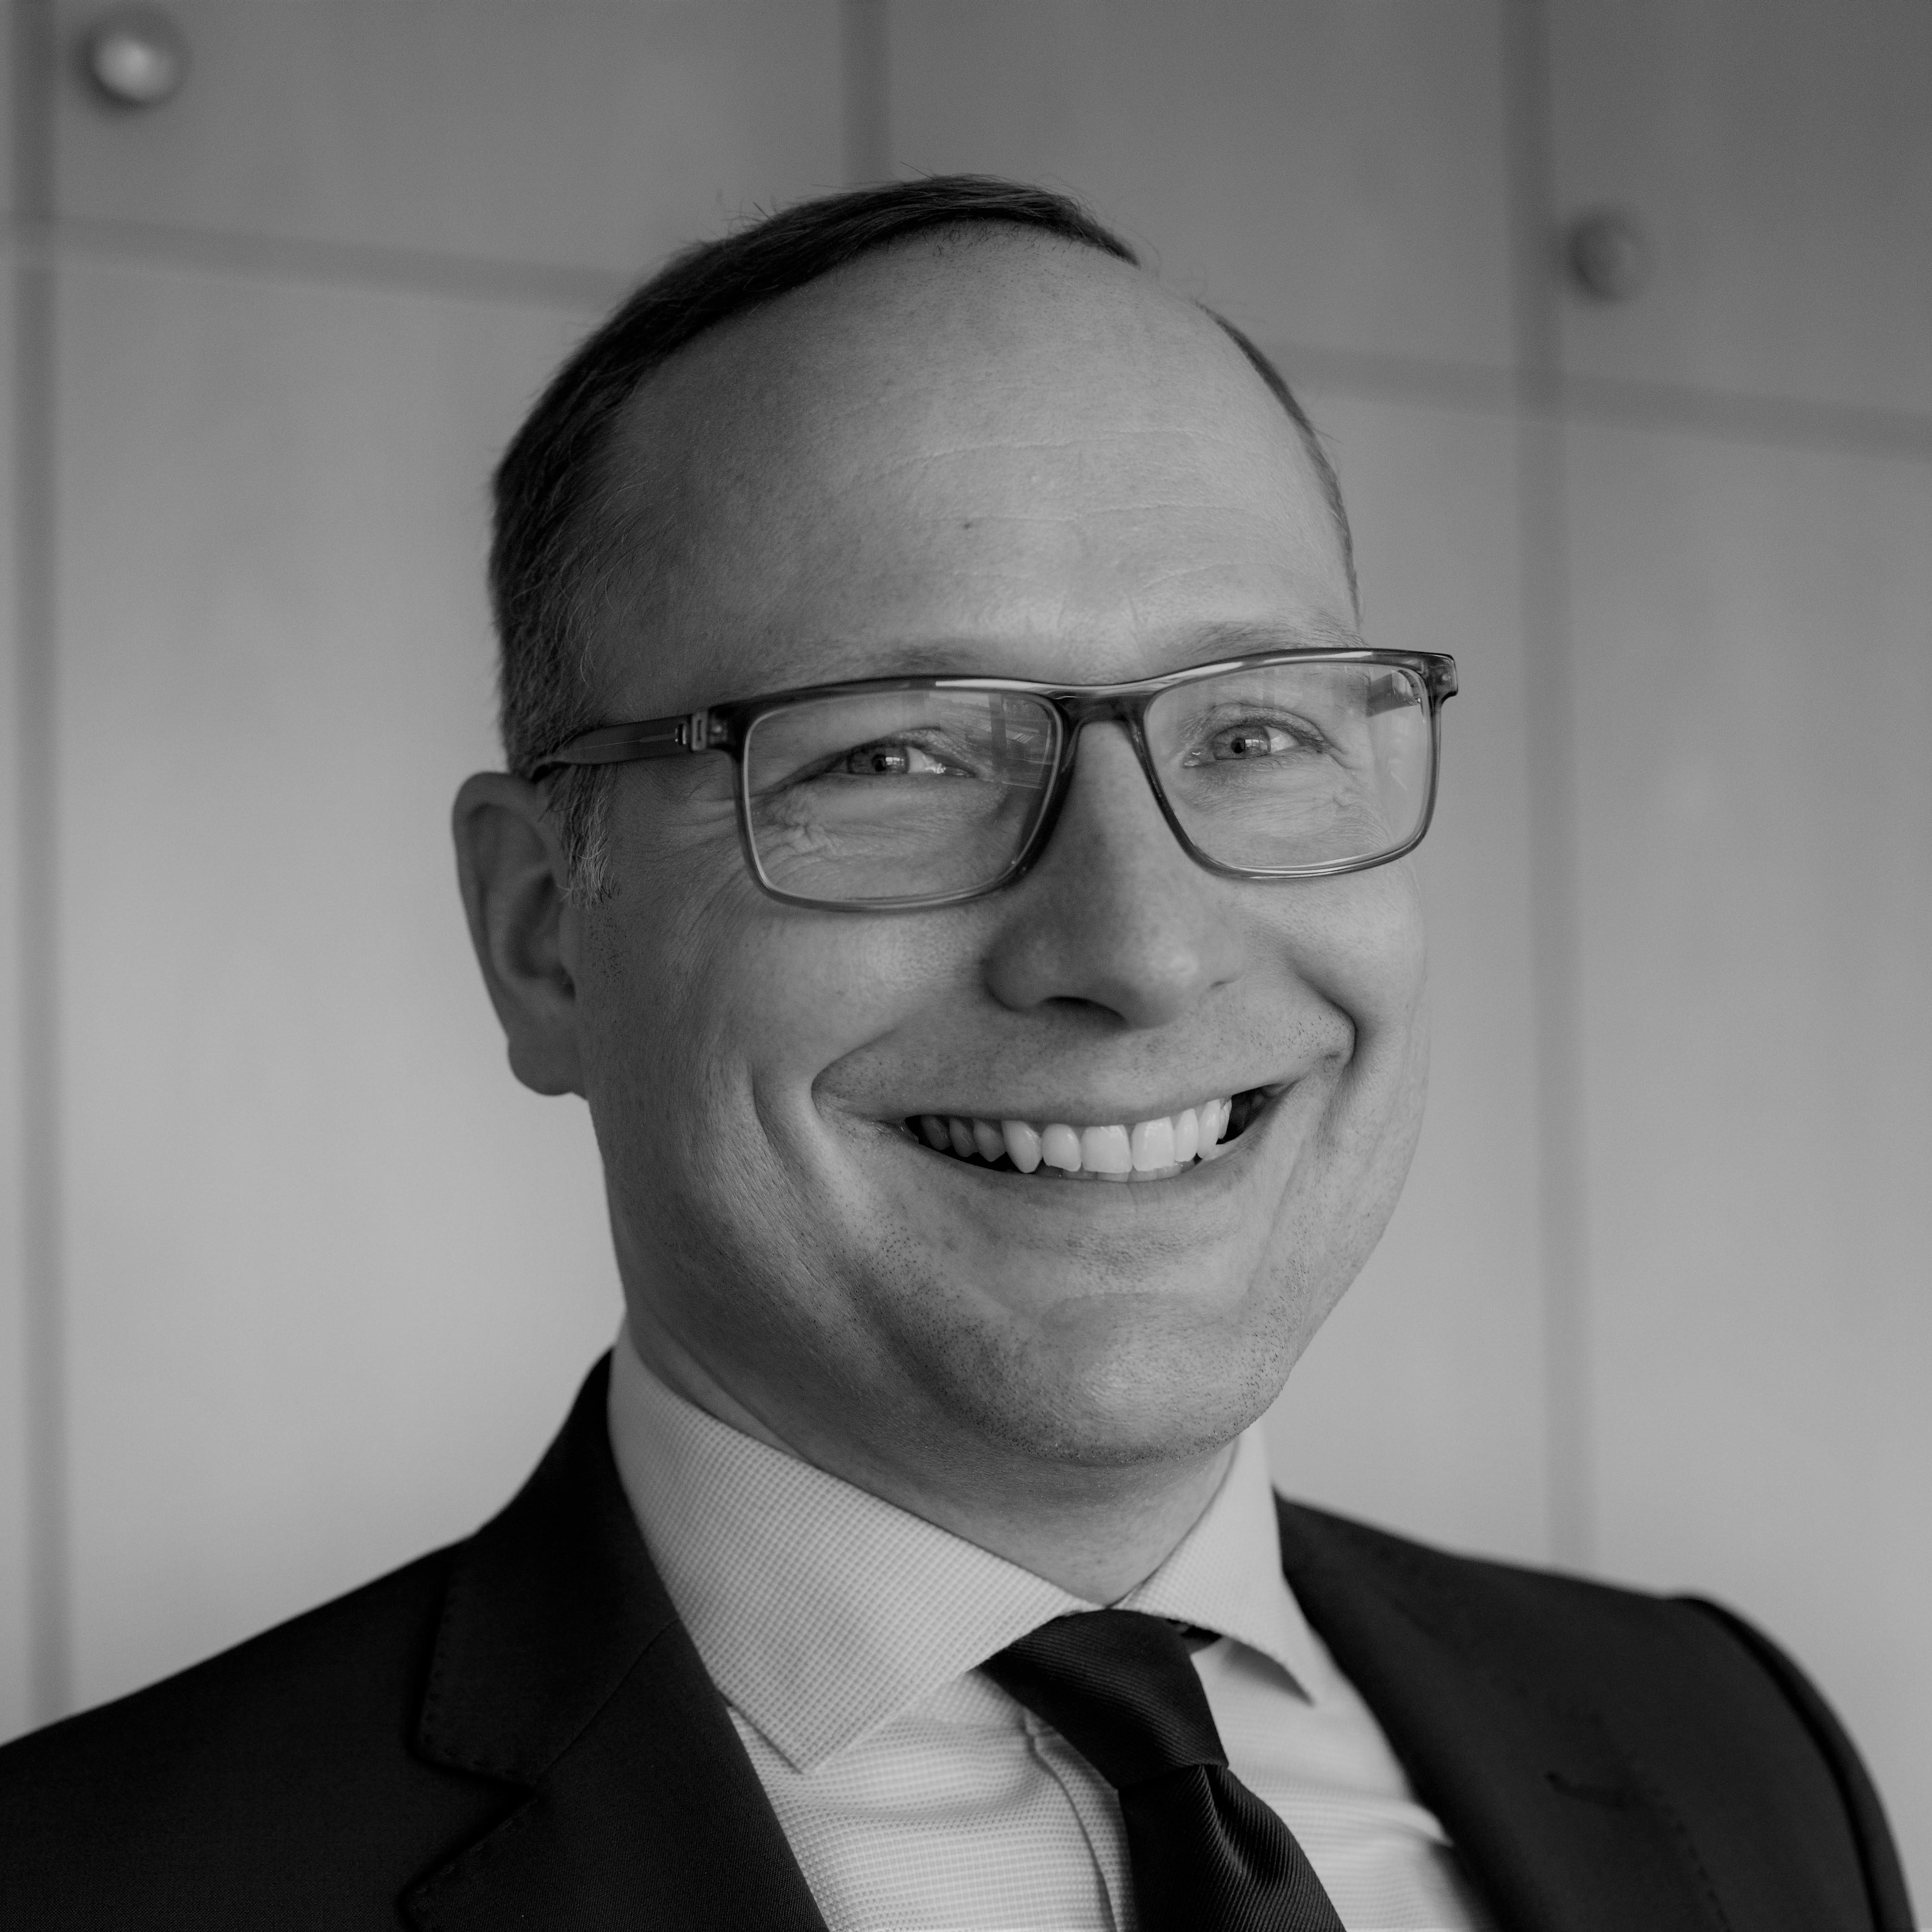 Daniel Wolter, Stadtwerke Garbsen